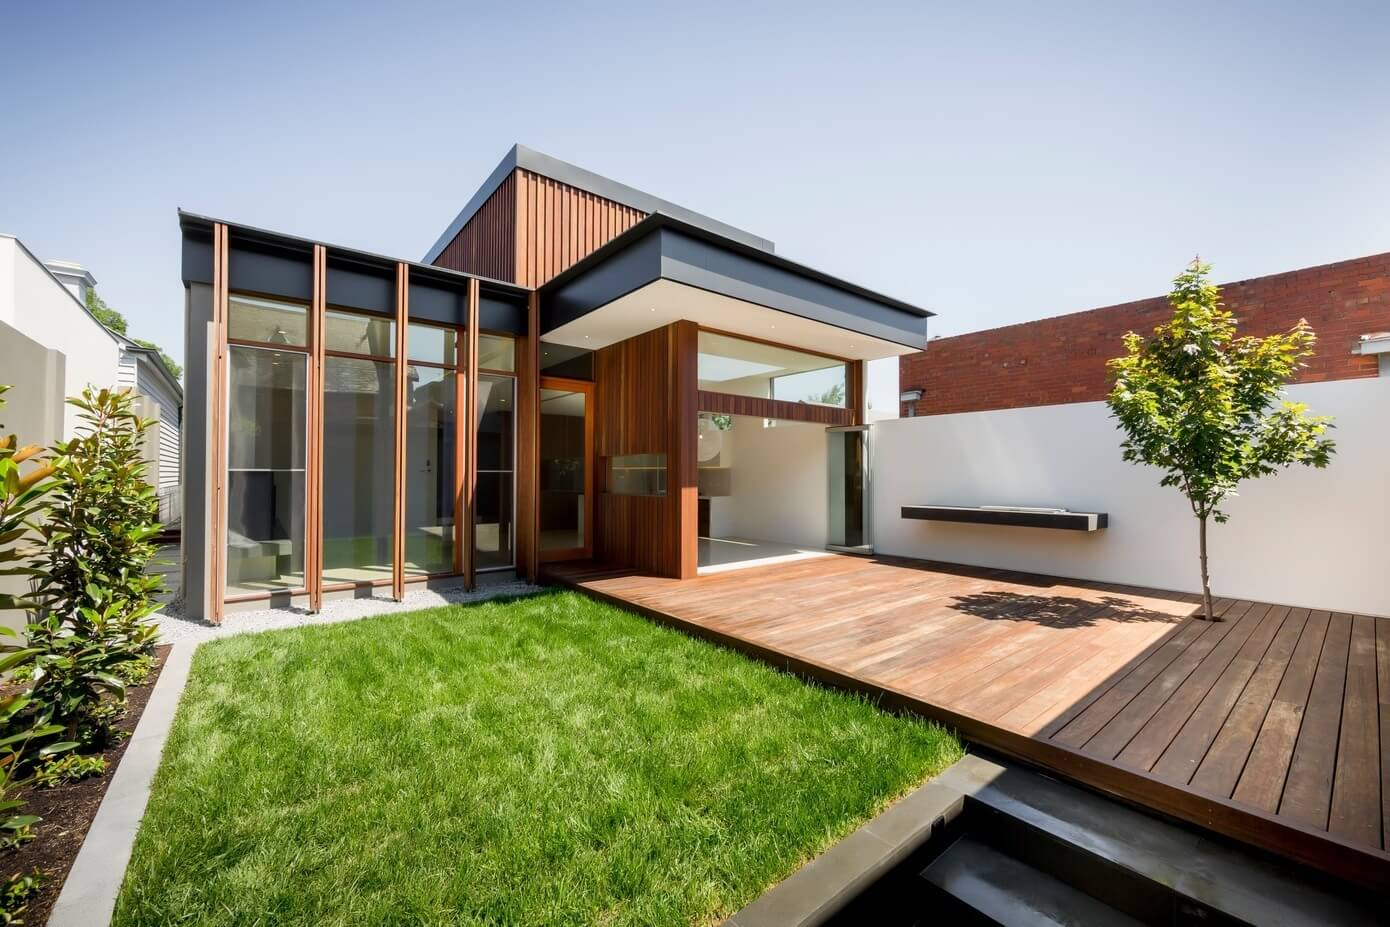 armadale-house-mitsuori-architects-01